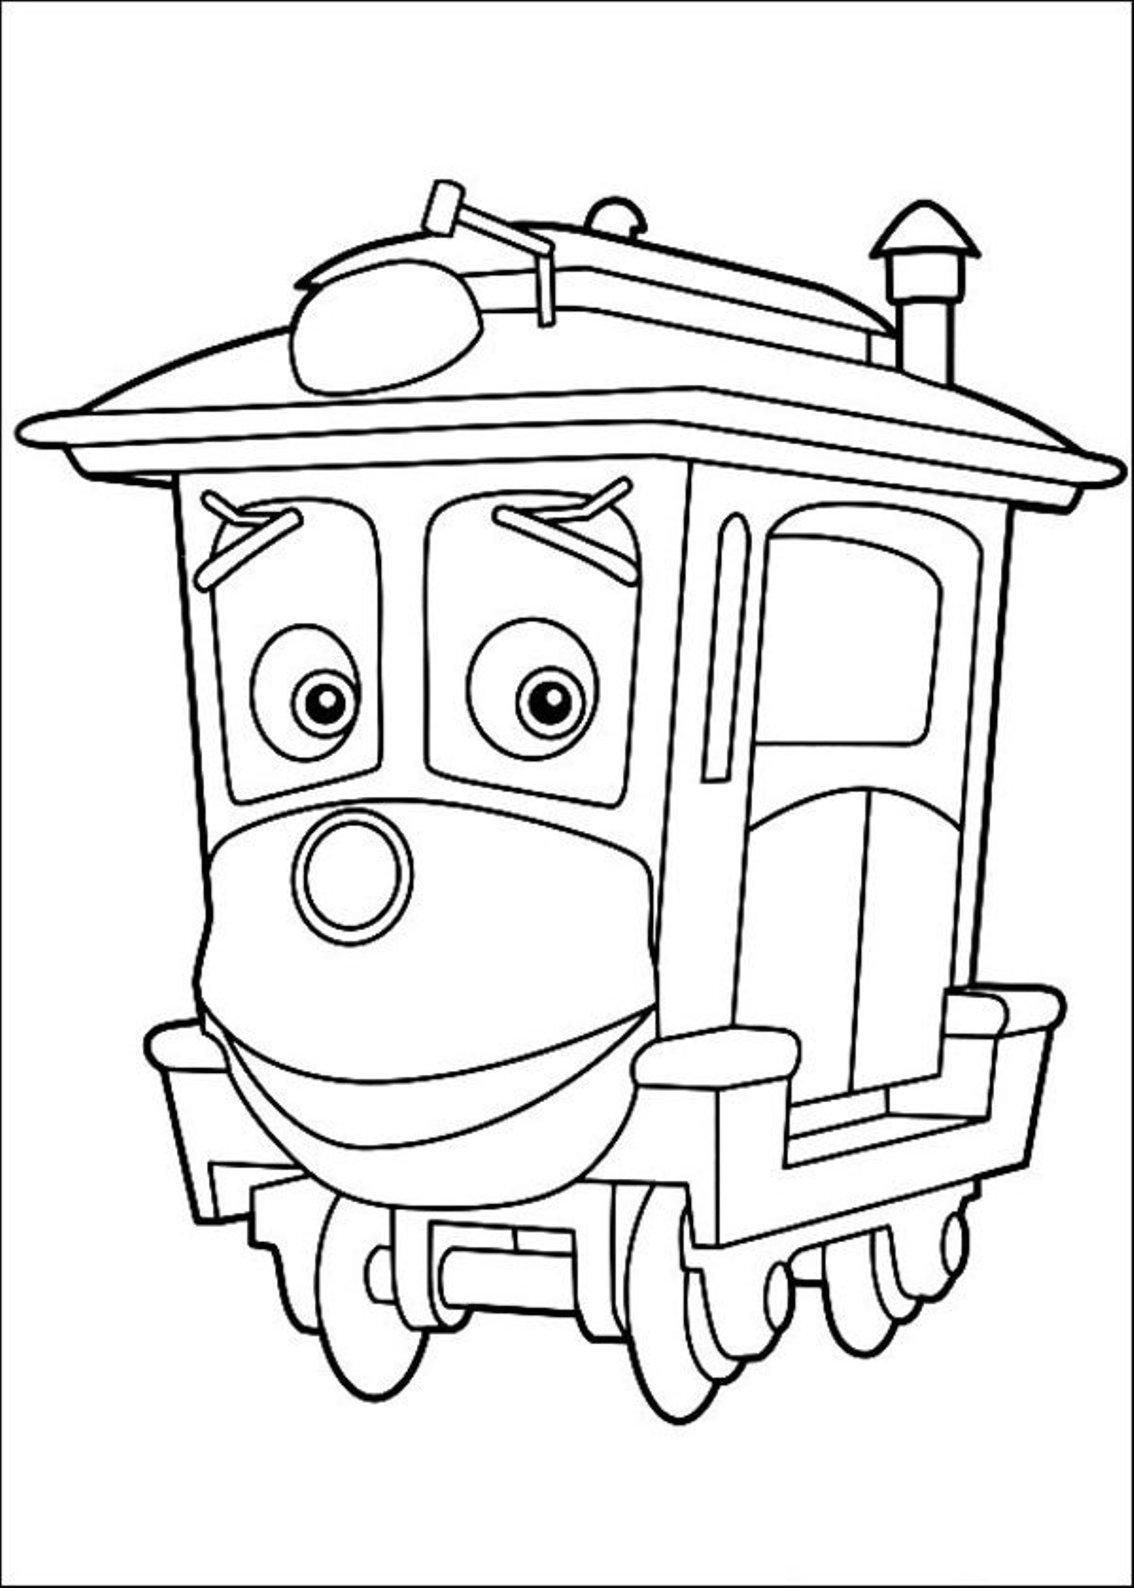 Chuggington Harrison Coloring Page | Coloring Pages